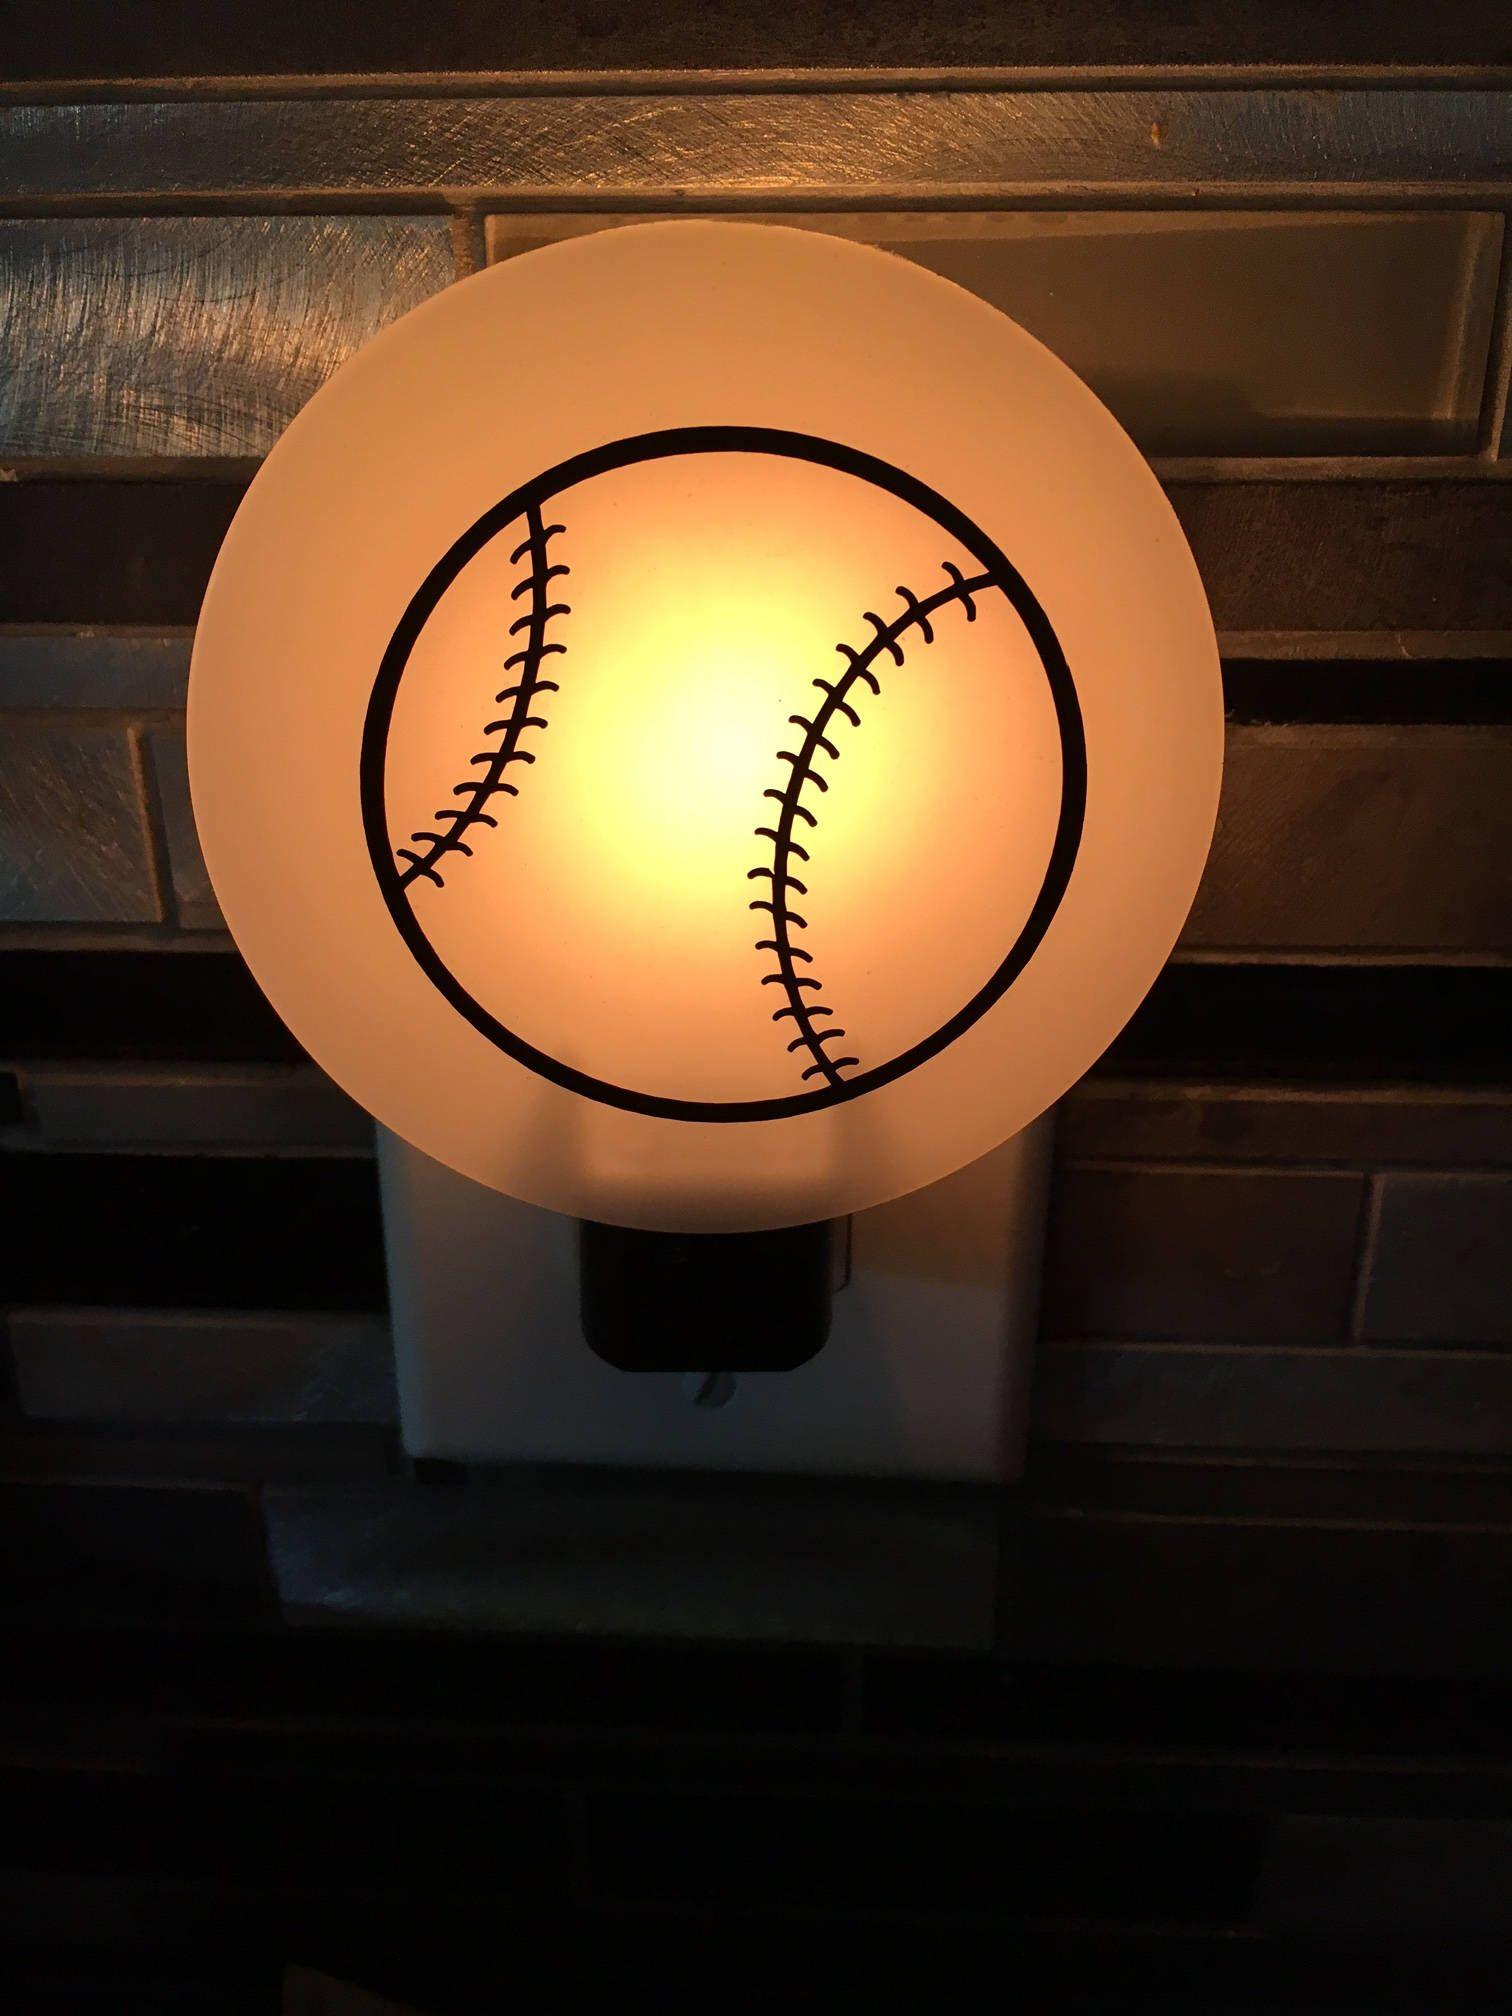 Baseball Night Light Decor Sports Room Art